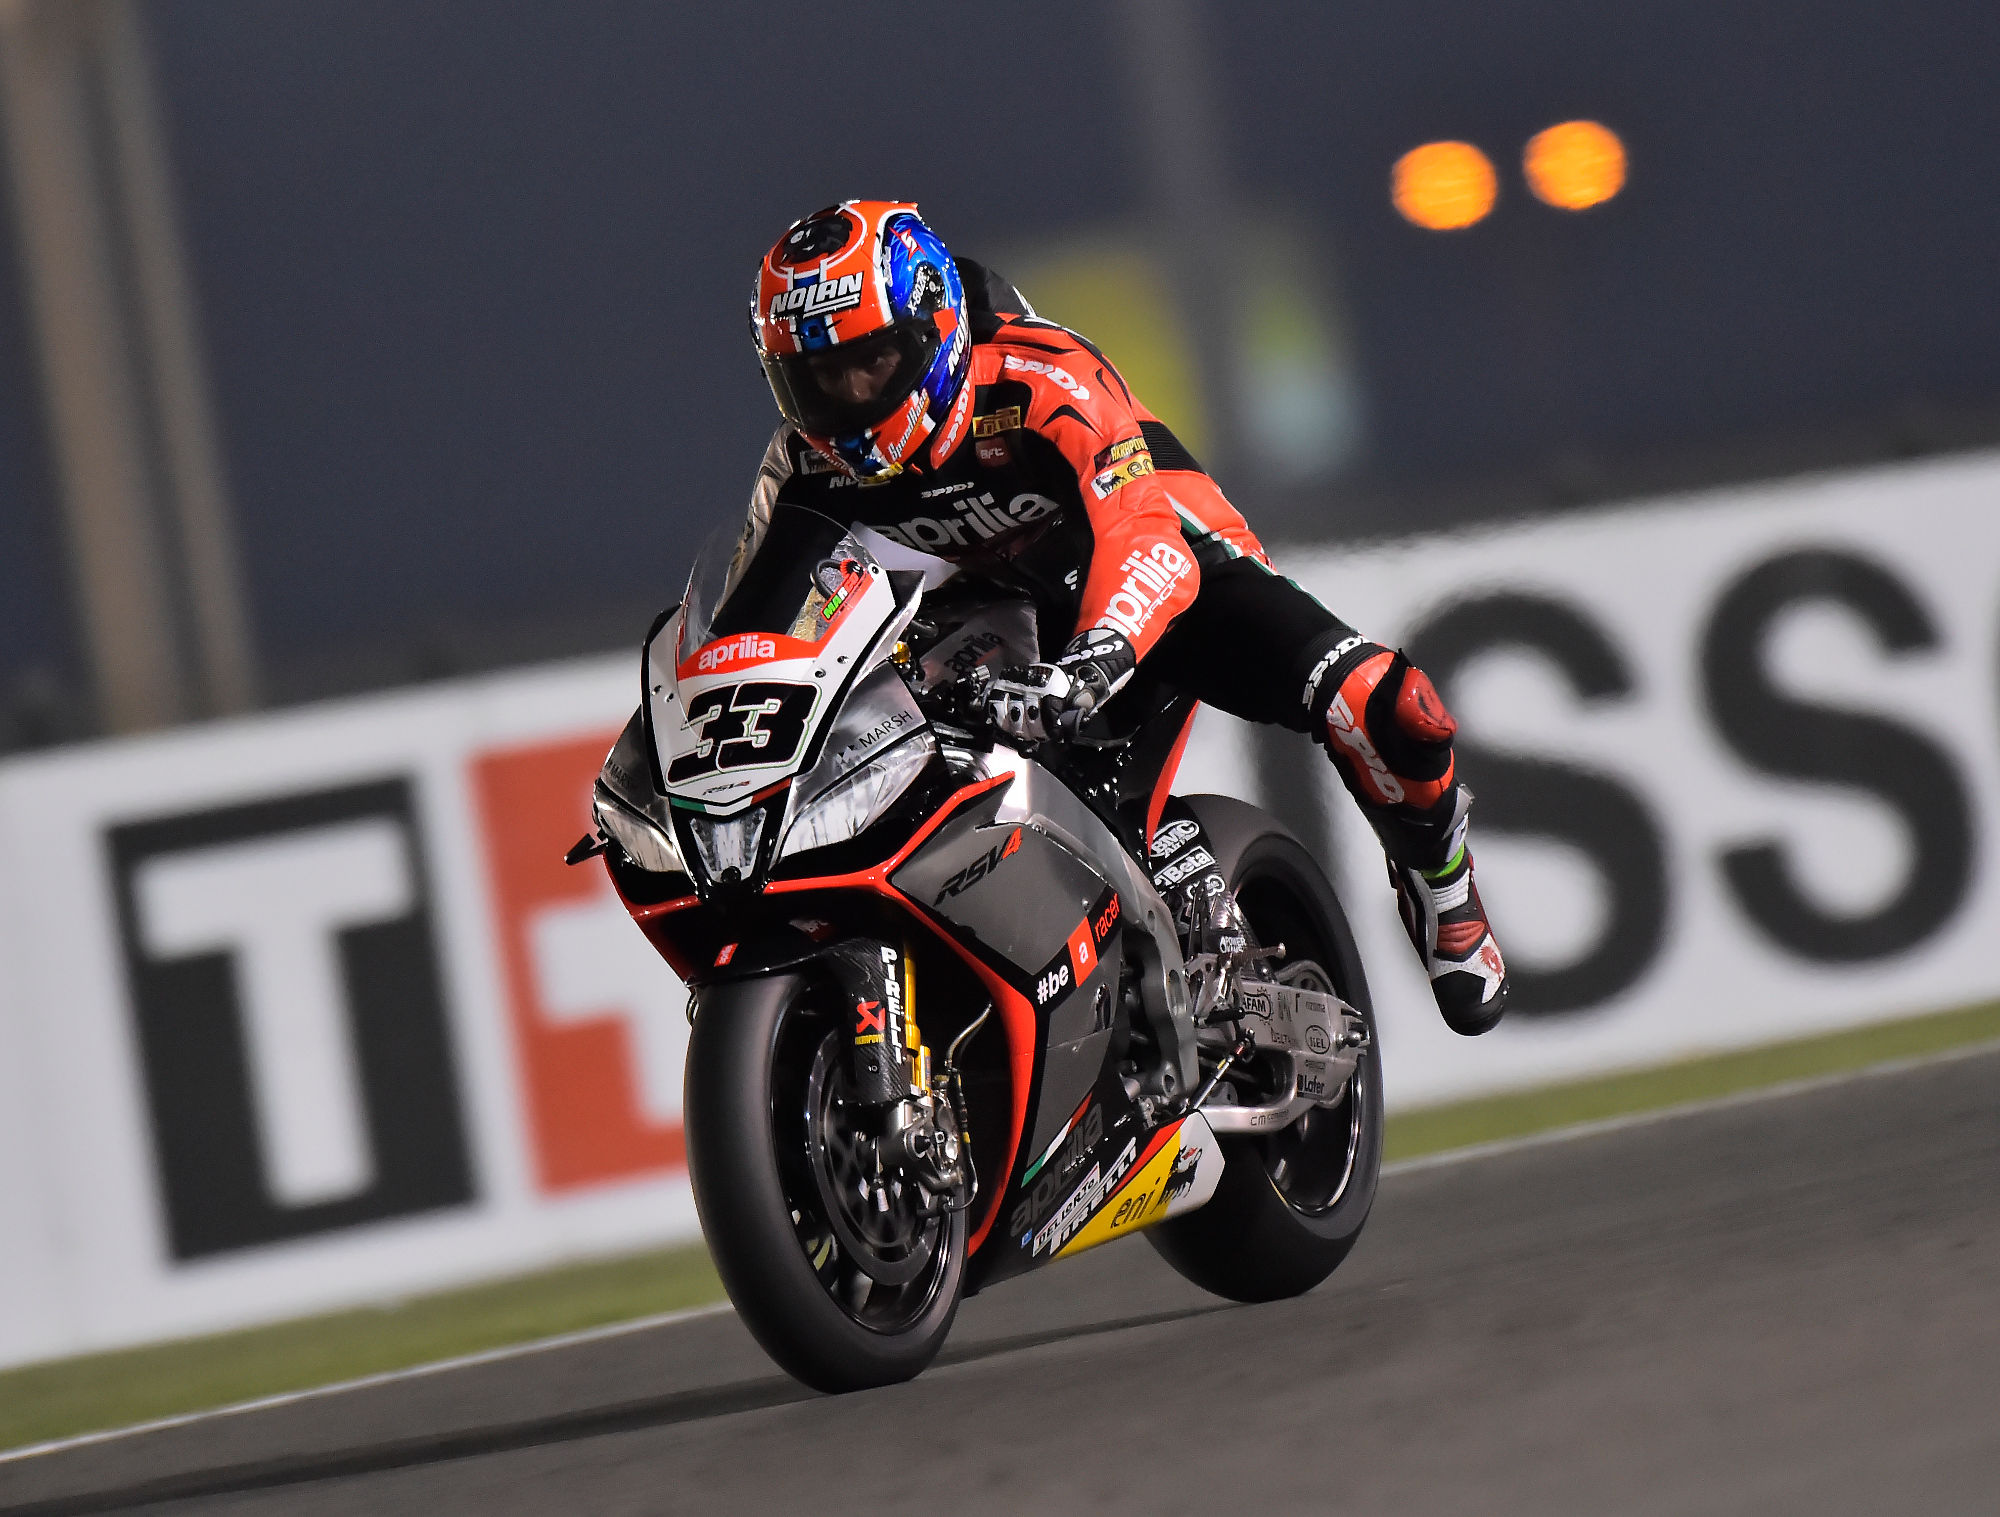 SBK 2014: Aprilia Racing, Marco Melandri, tanti problemi di grip per lui in Qatar